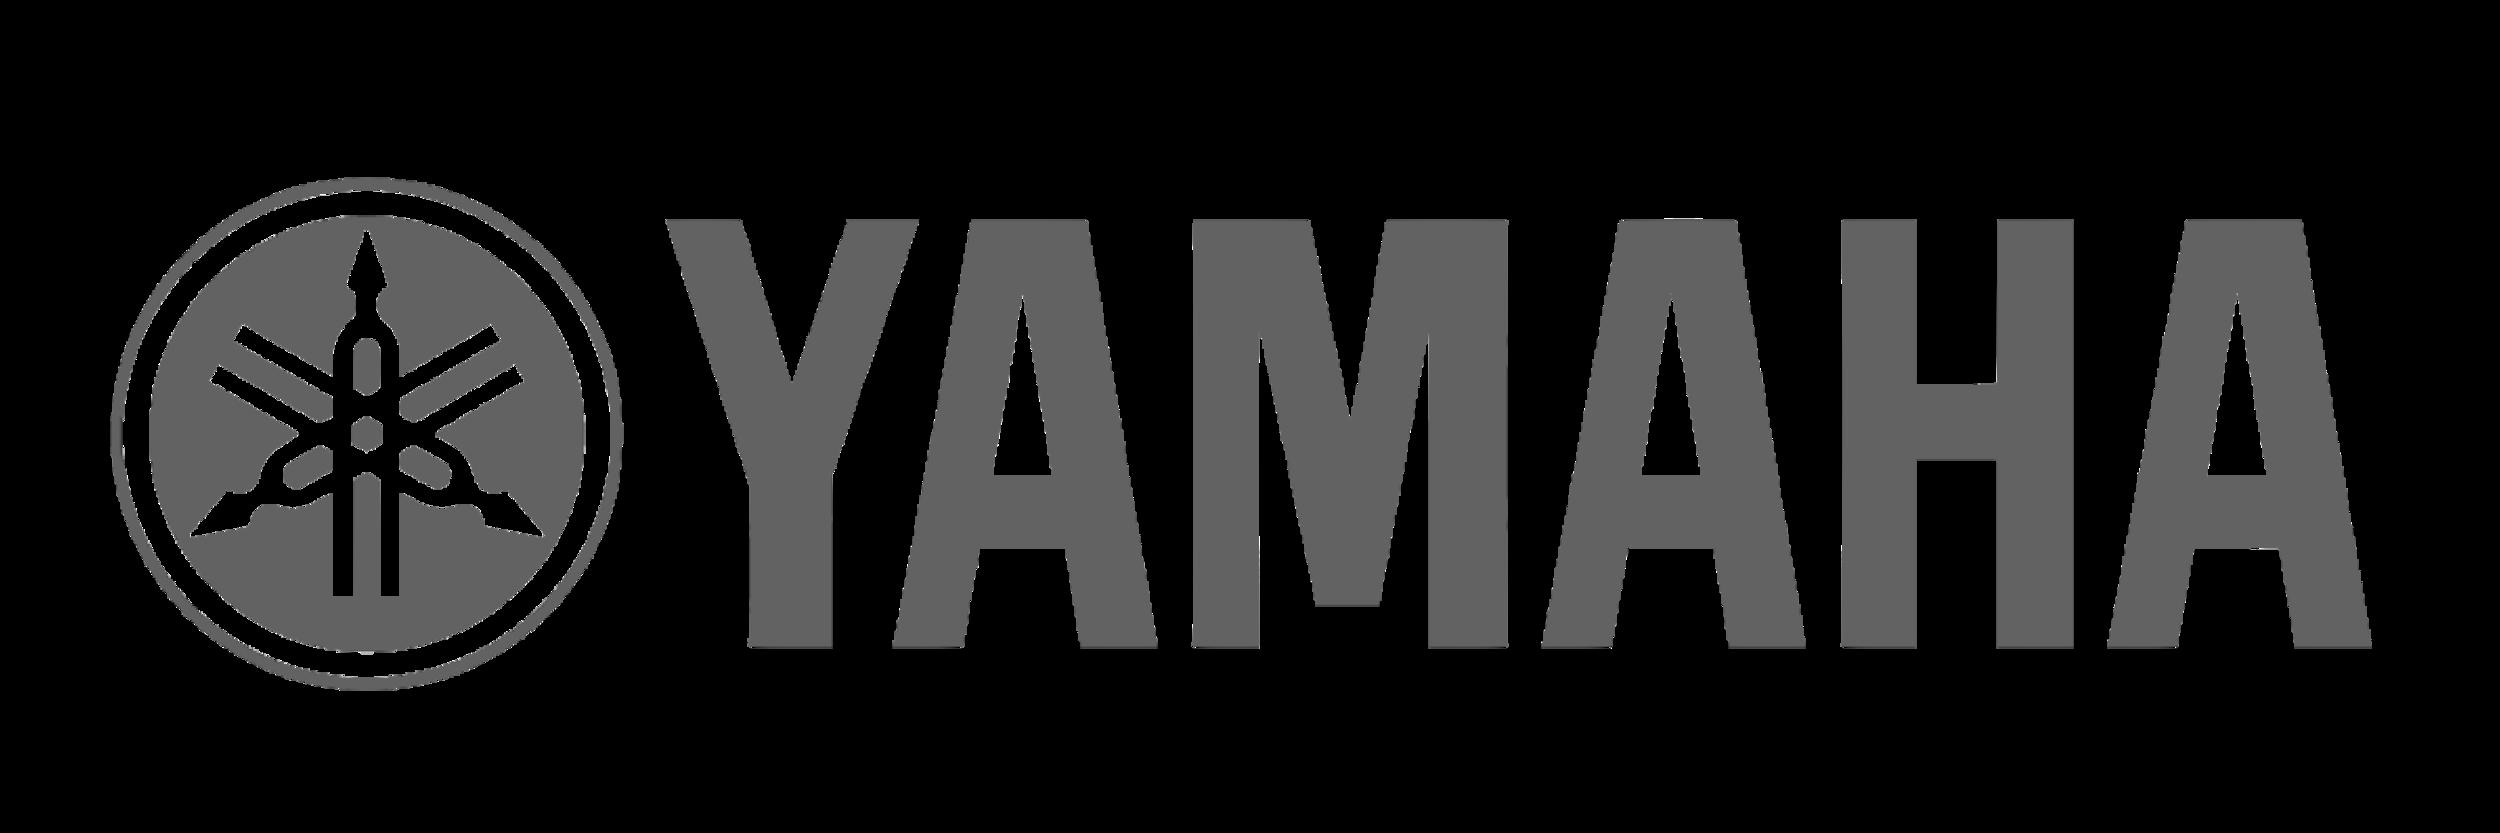 yamaha_logo gray.png